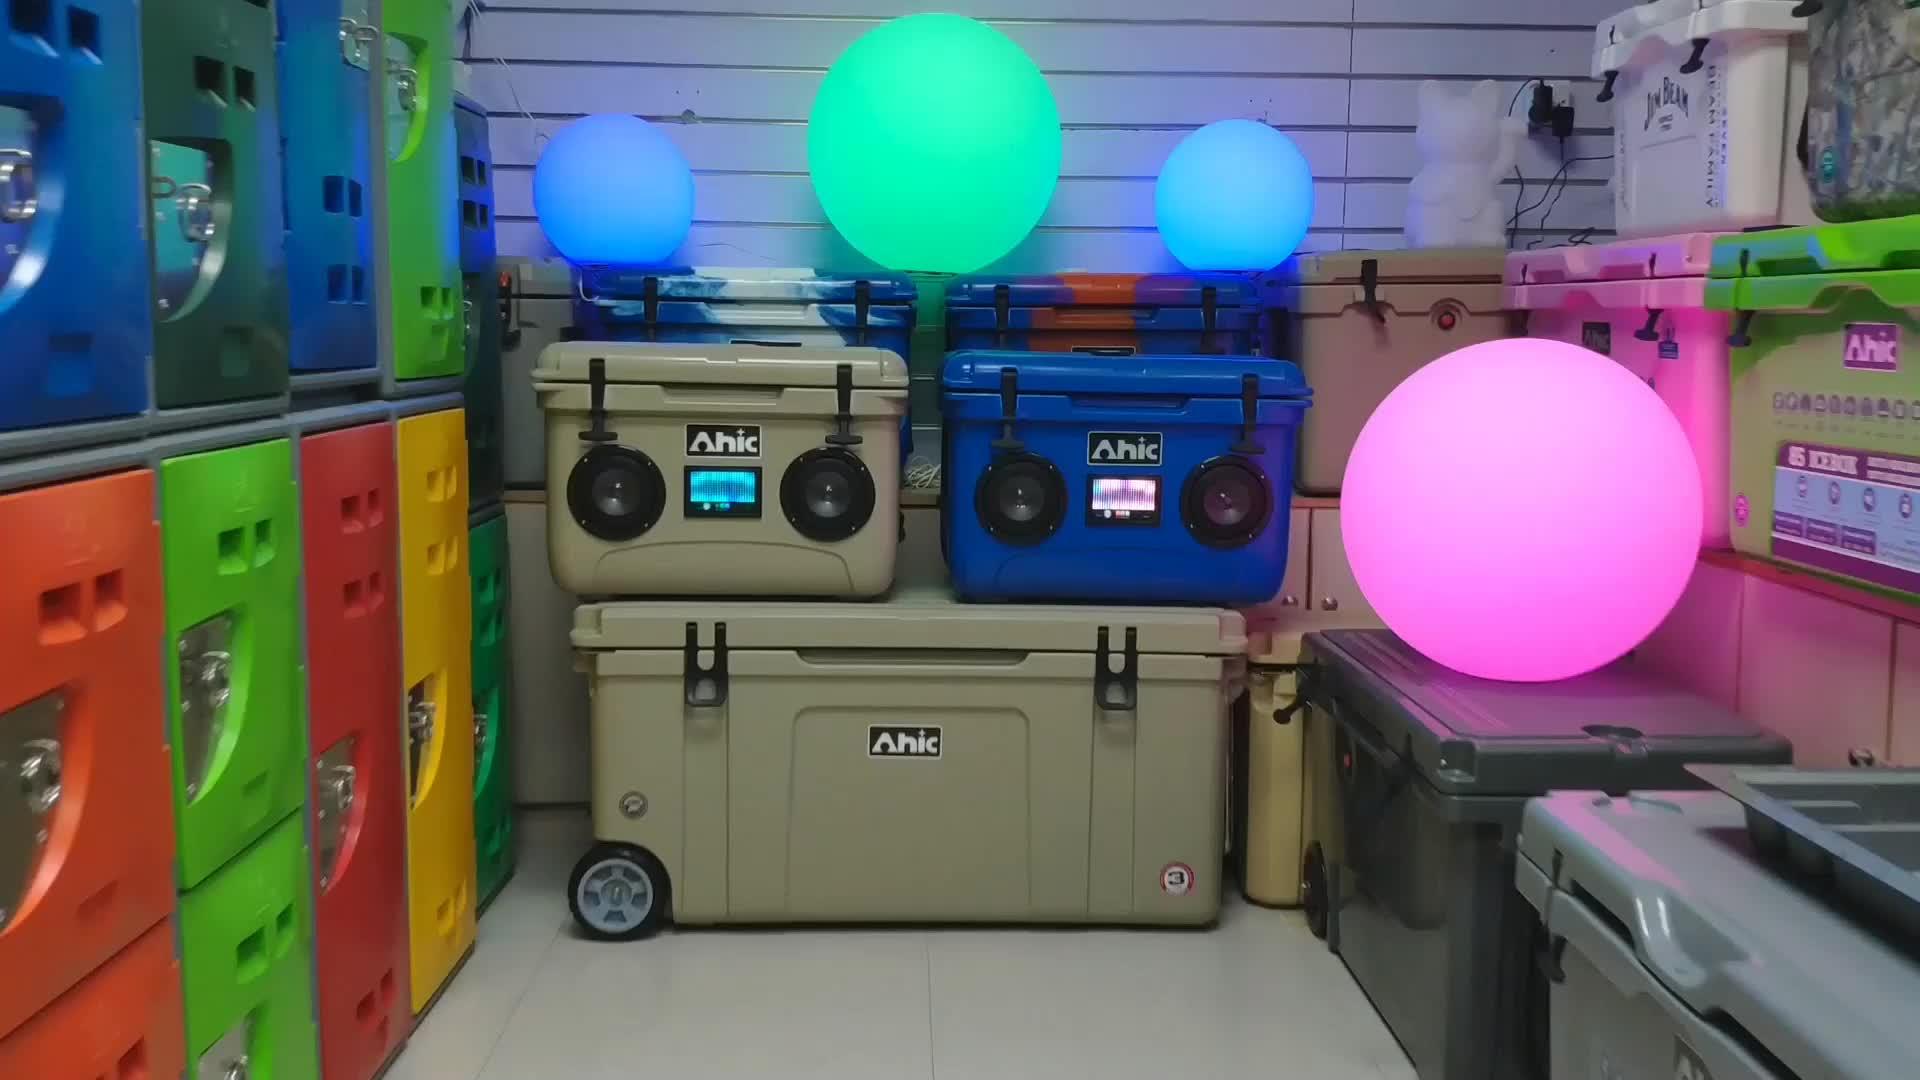 Portable cooler box บลูทูธ cooler วิทยุ,เพลงที่มีสีสัน cooler,Cooler ลำโพงไร้สายบลูทูธ